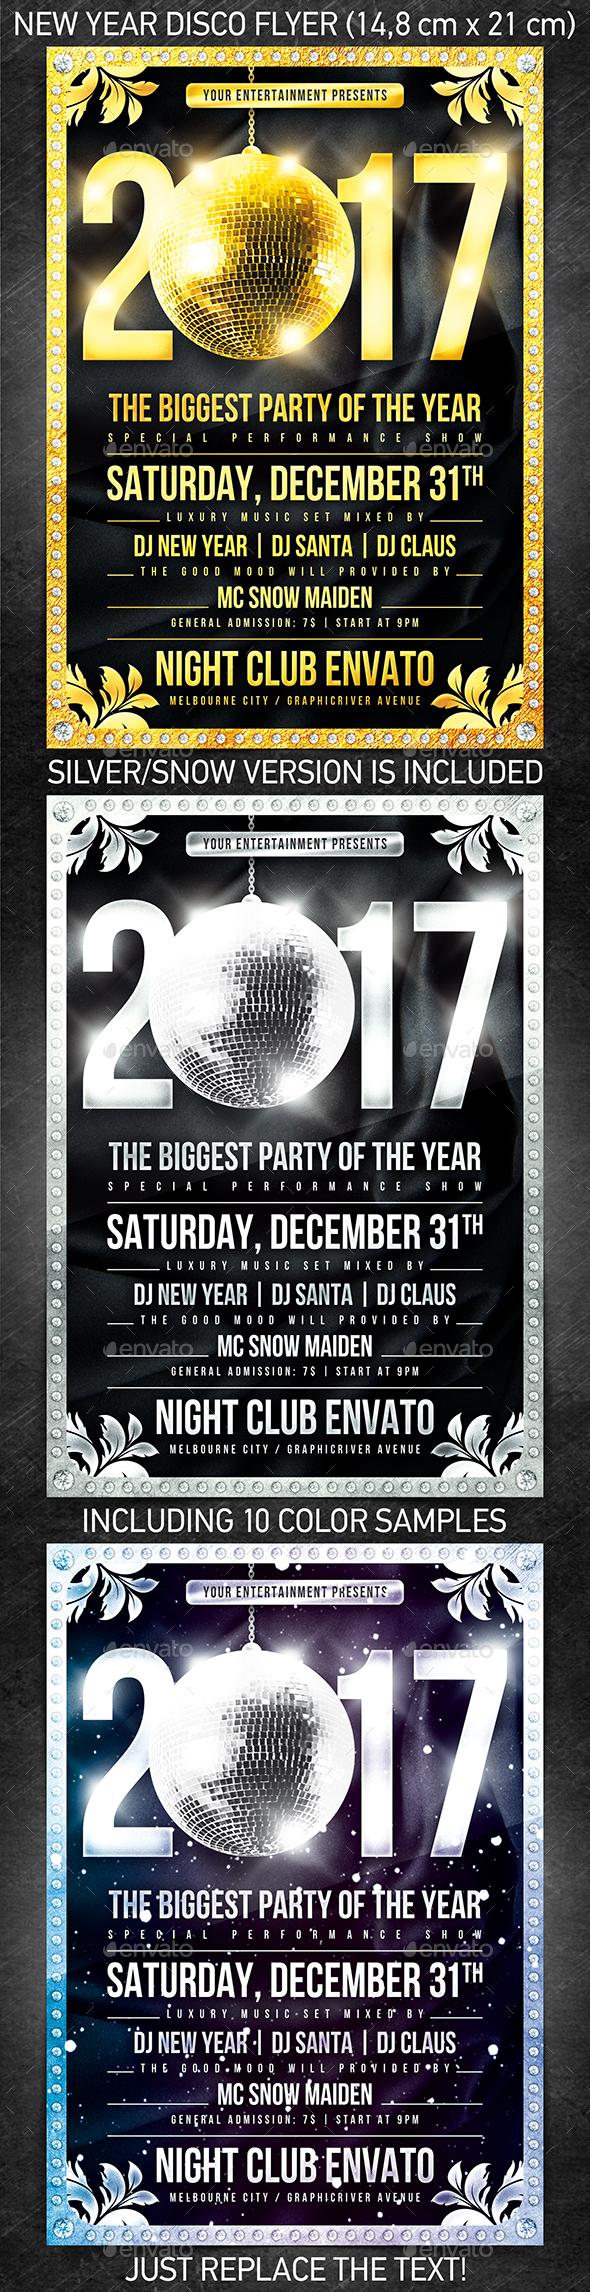 New Year Disco Flyer #1 - Print Templates